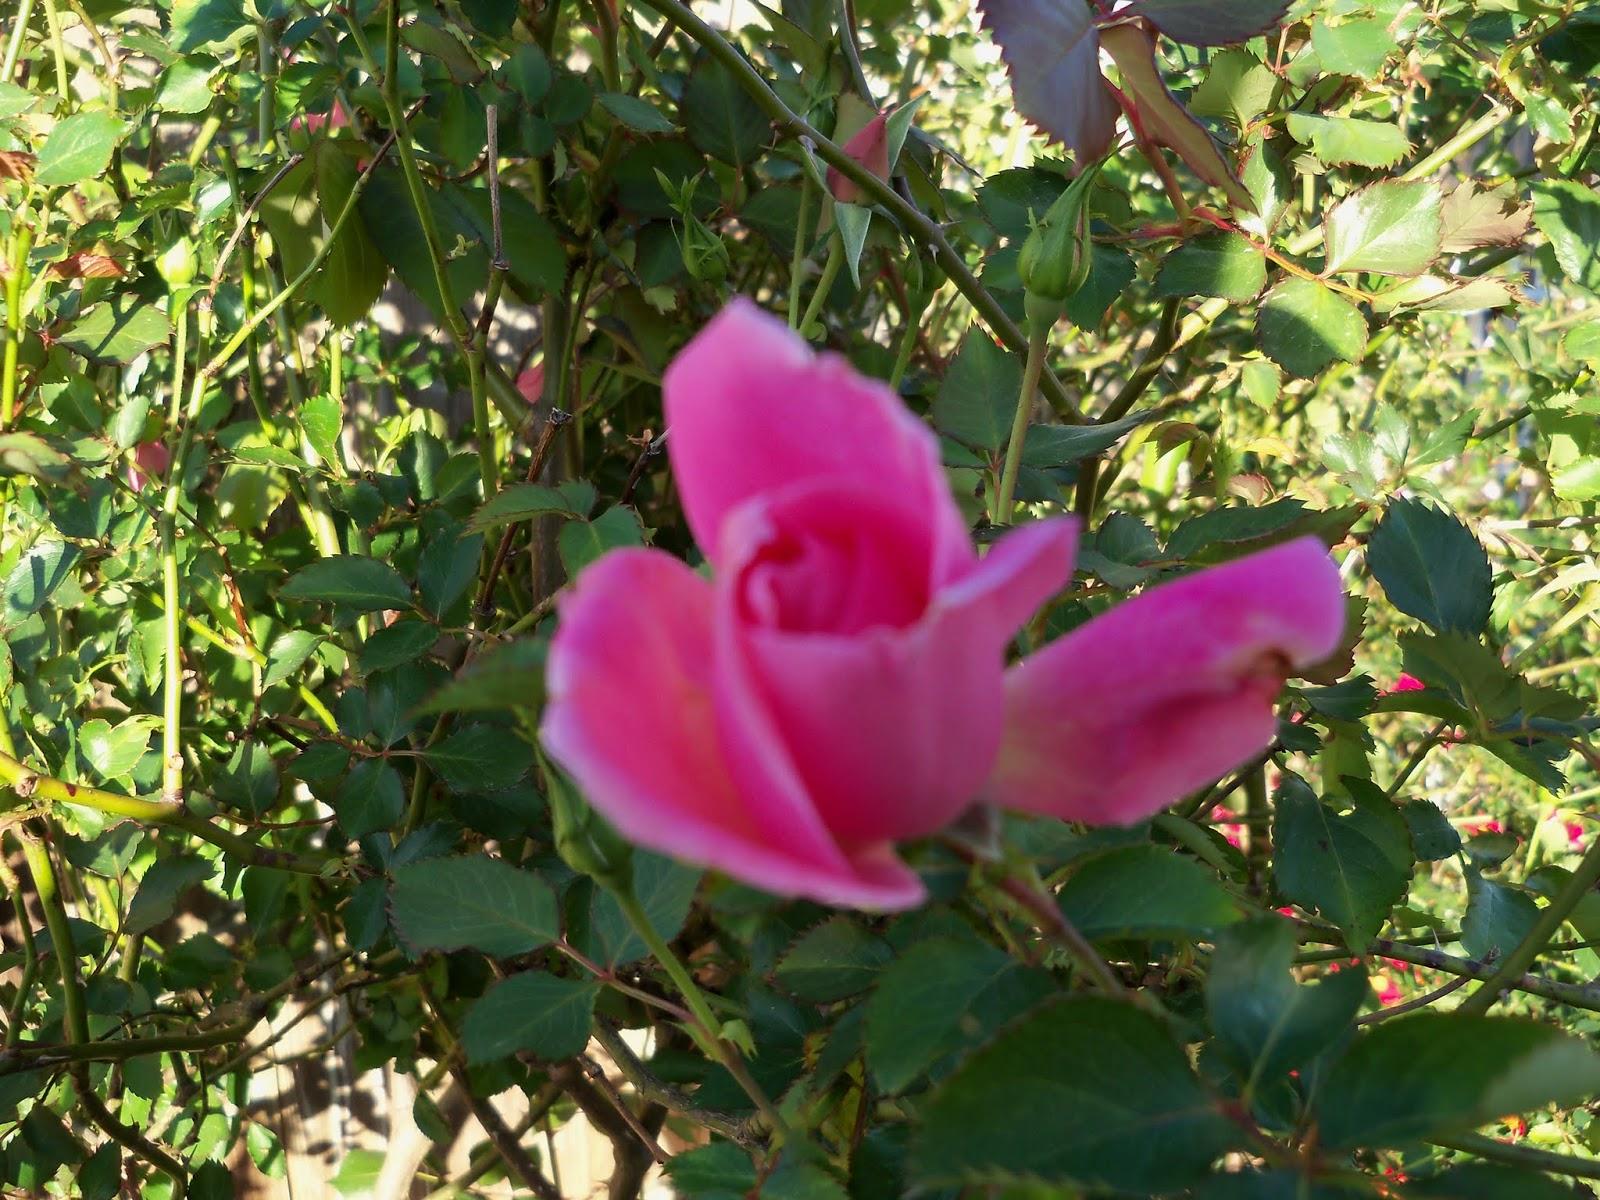 Gardening 2013 - 115_5397.JPG